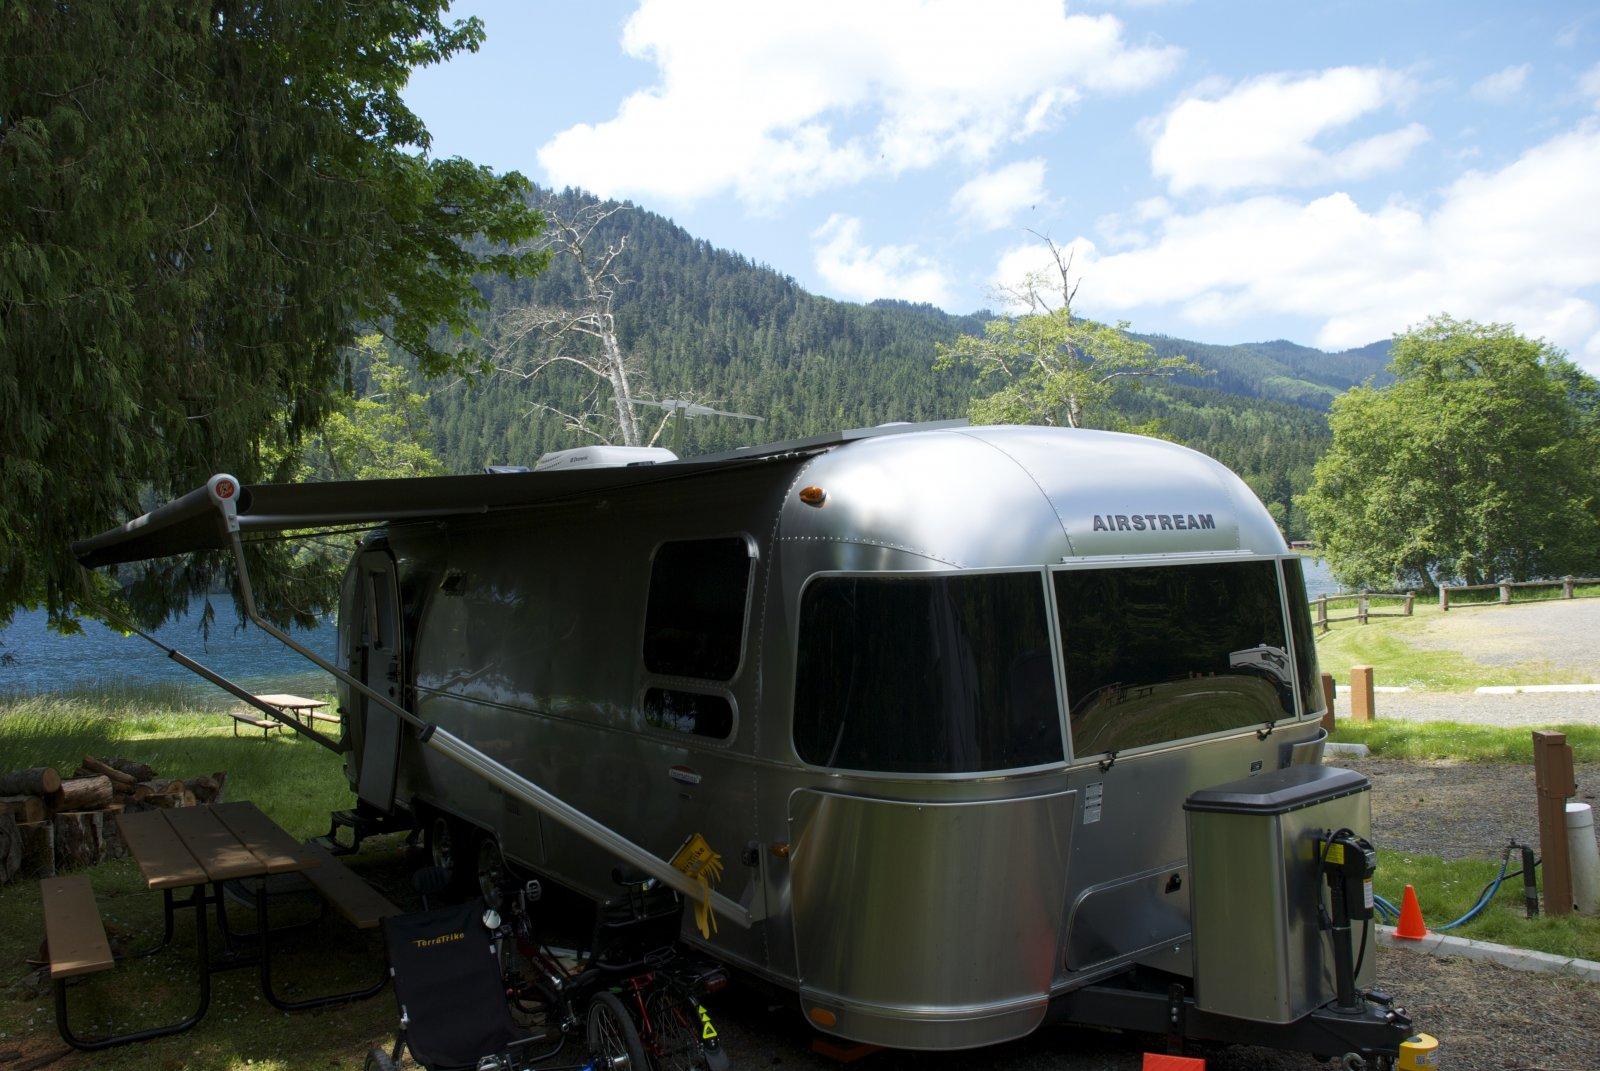 Click image for larger version  Name:Camping at Lake Crescent Log Cabin Resort.jpg Views:73 Size:293.2 KB ID:217633